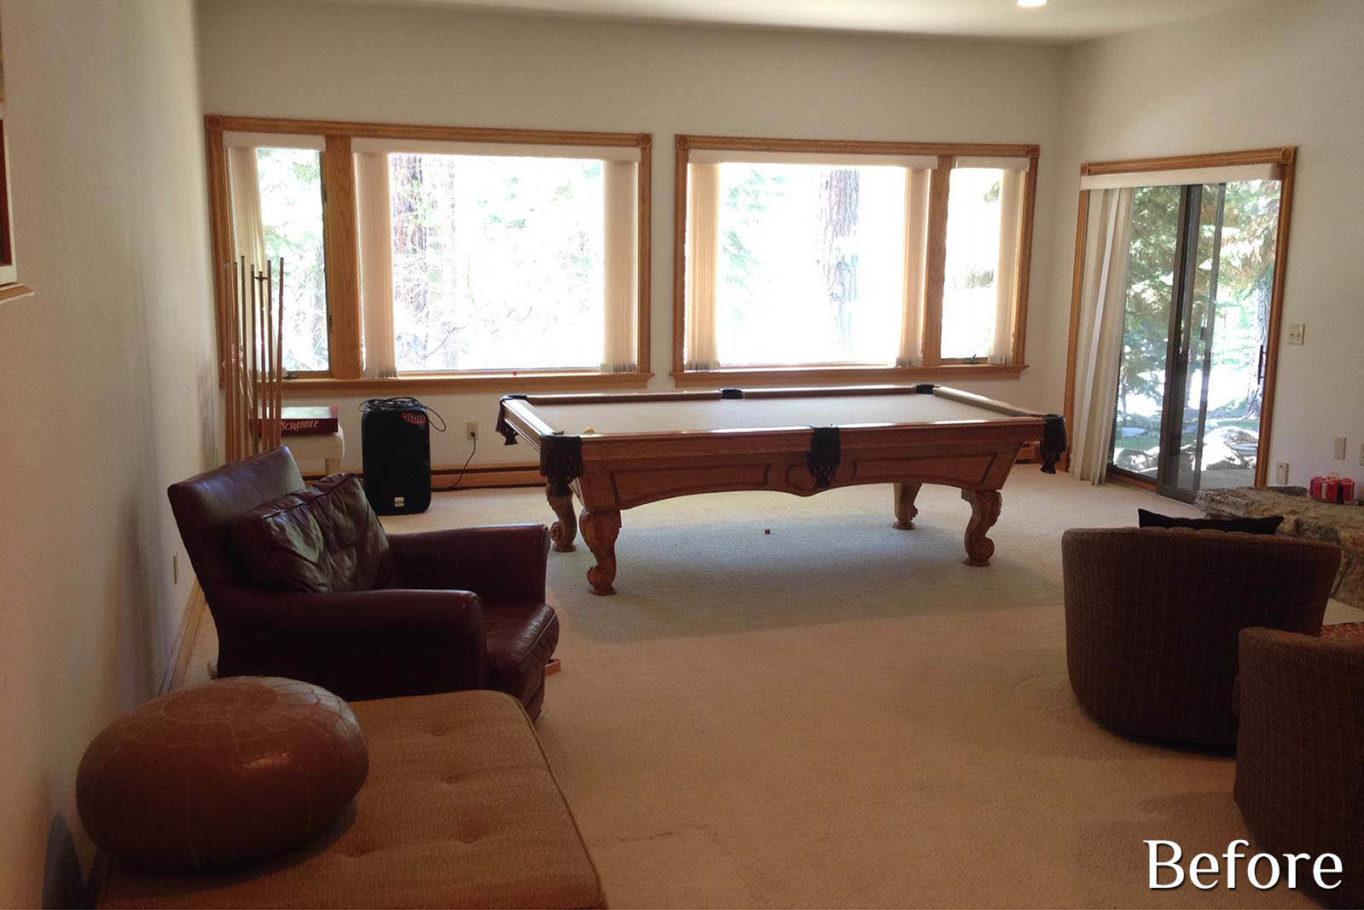 Game Room before remodel - Talie Jane Interiors